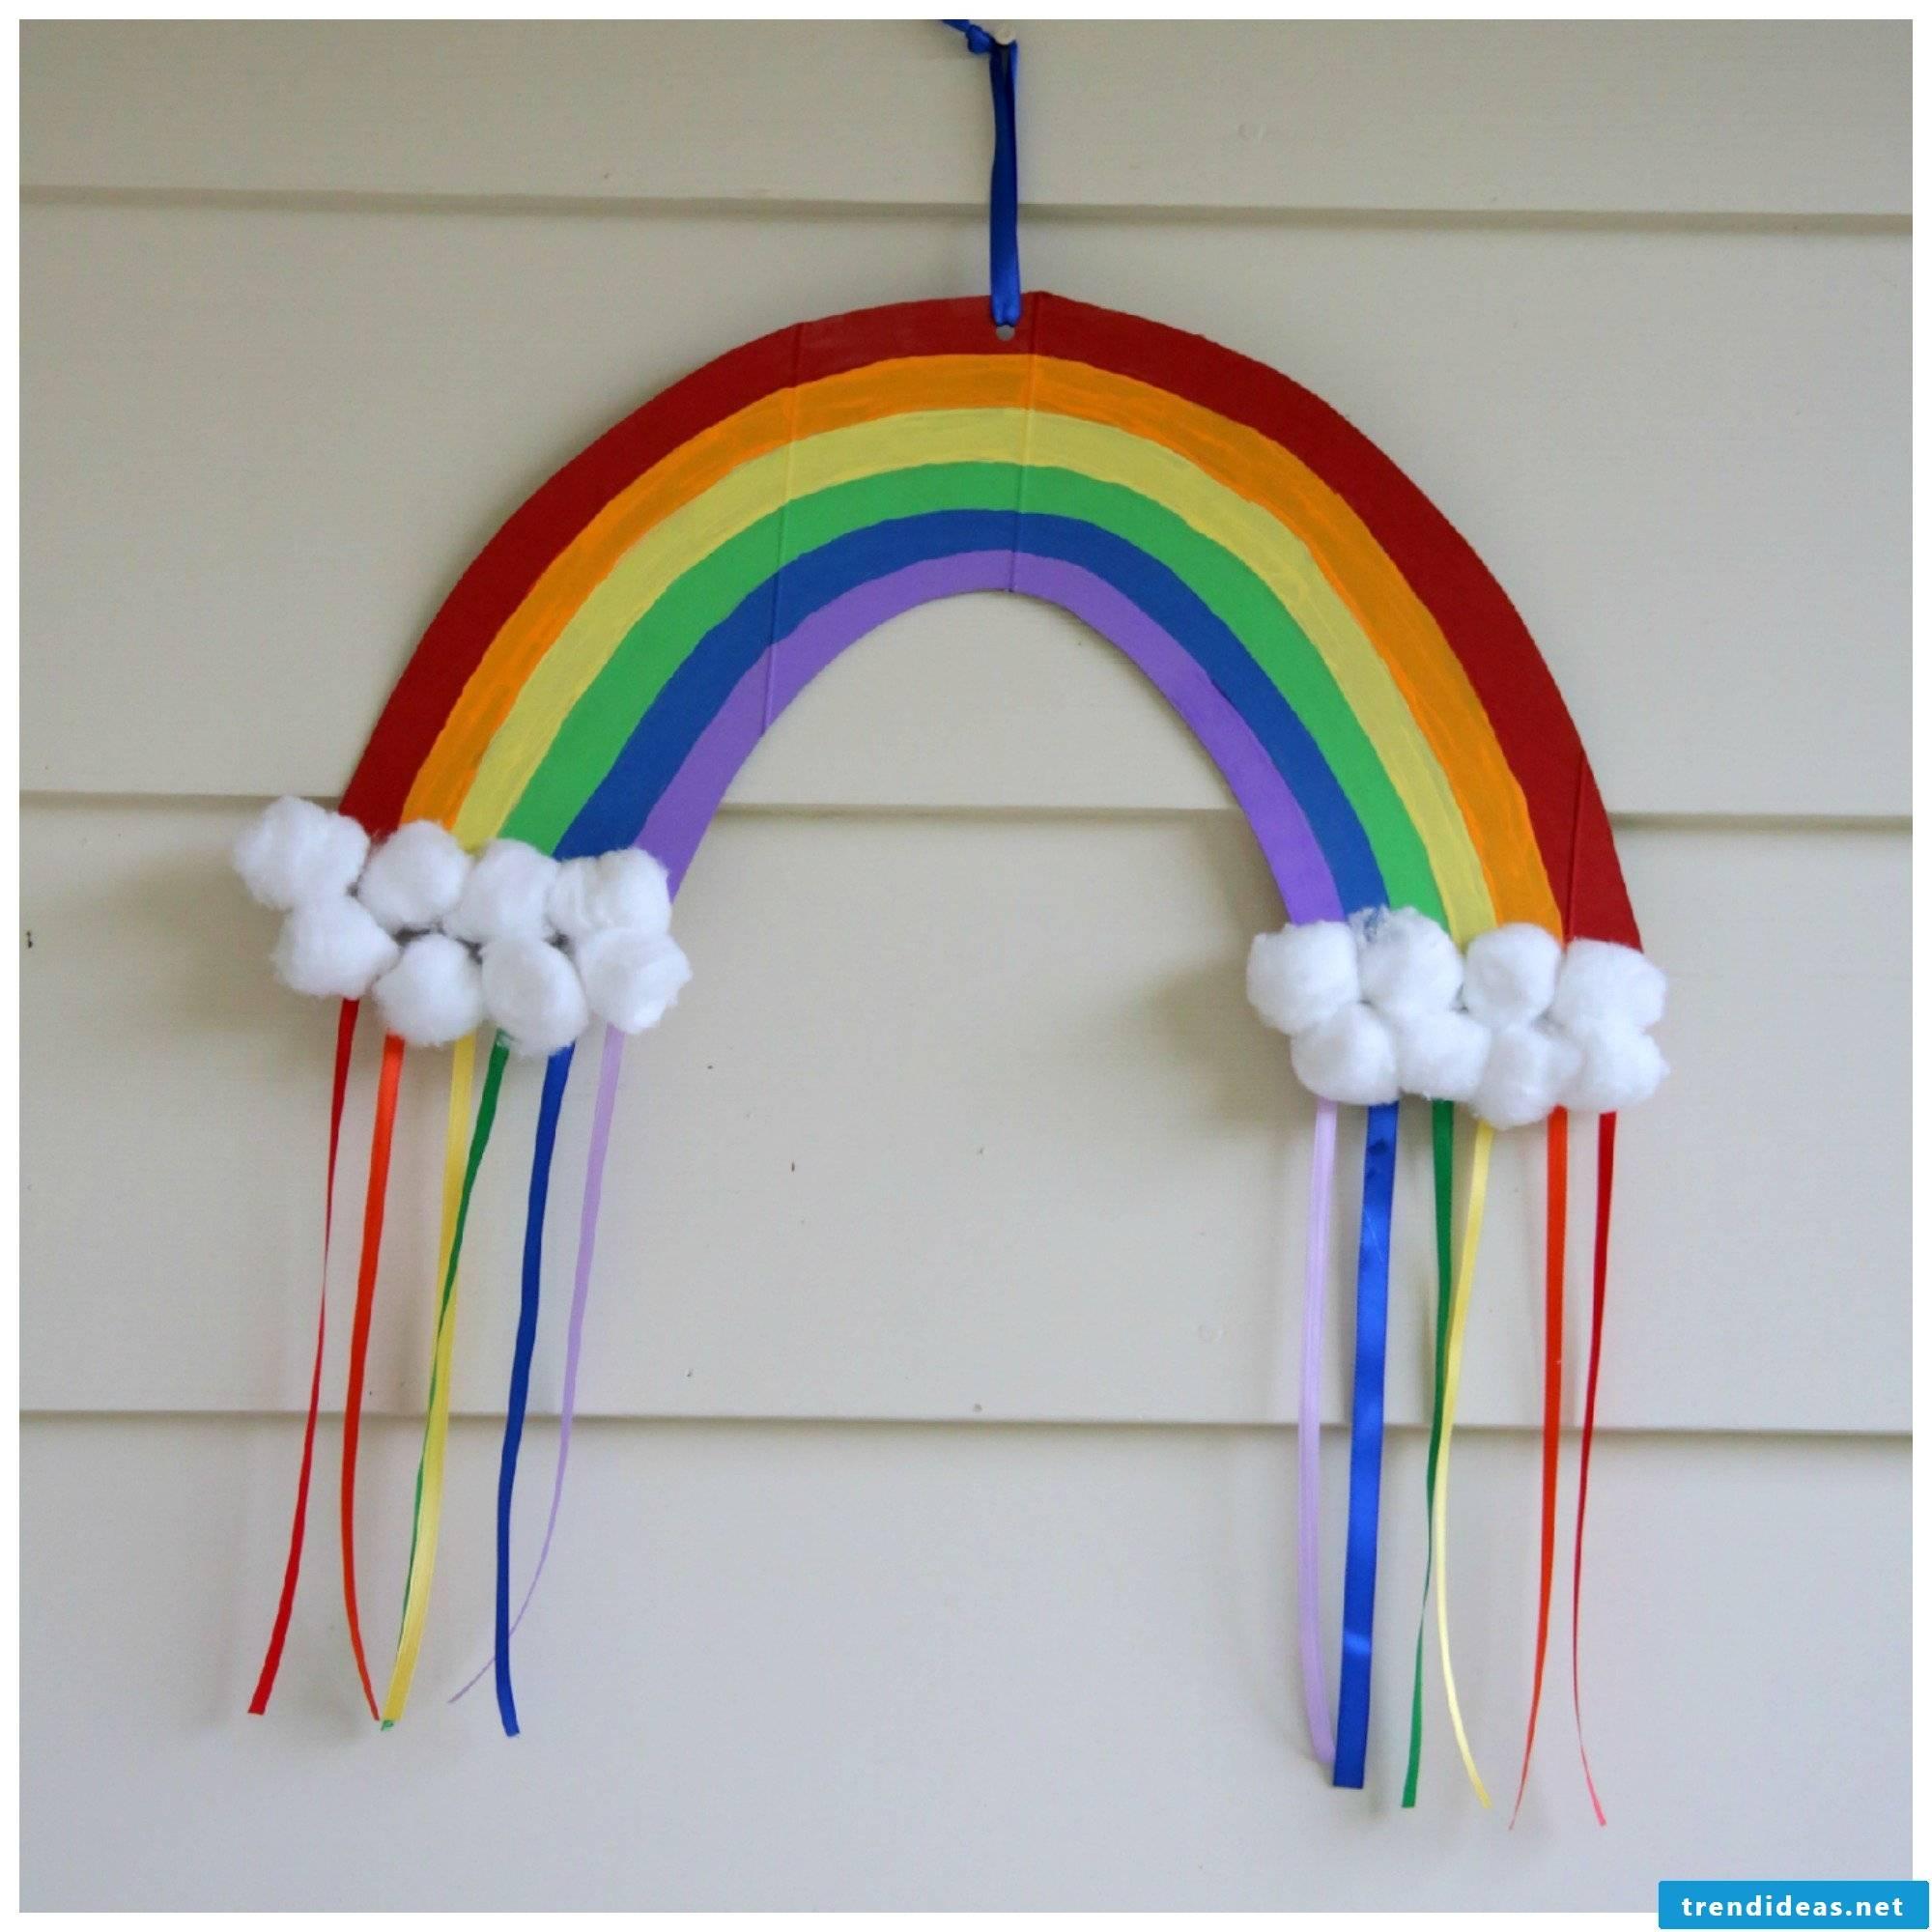 The rainbow mobile